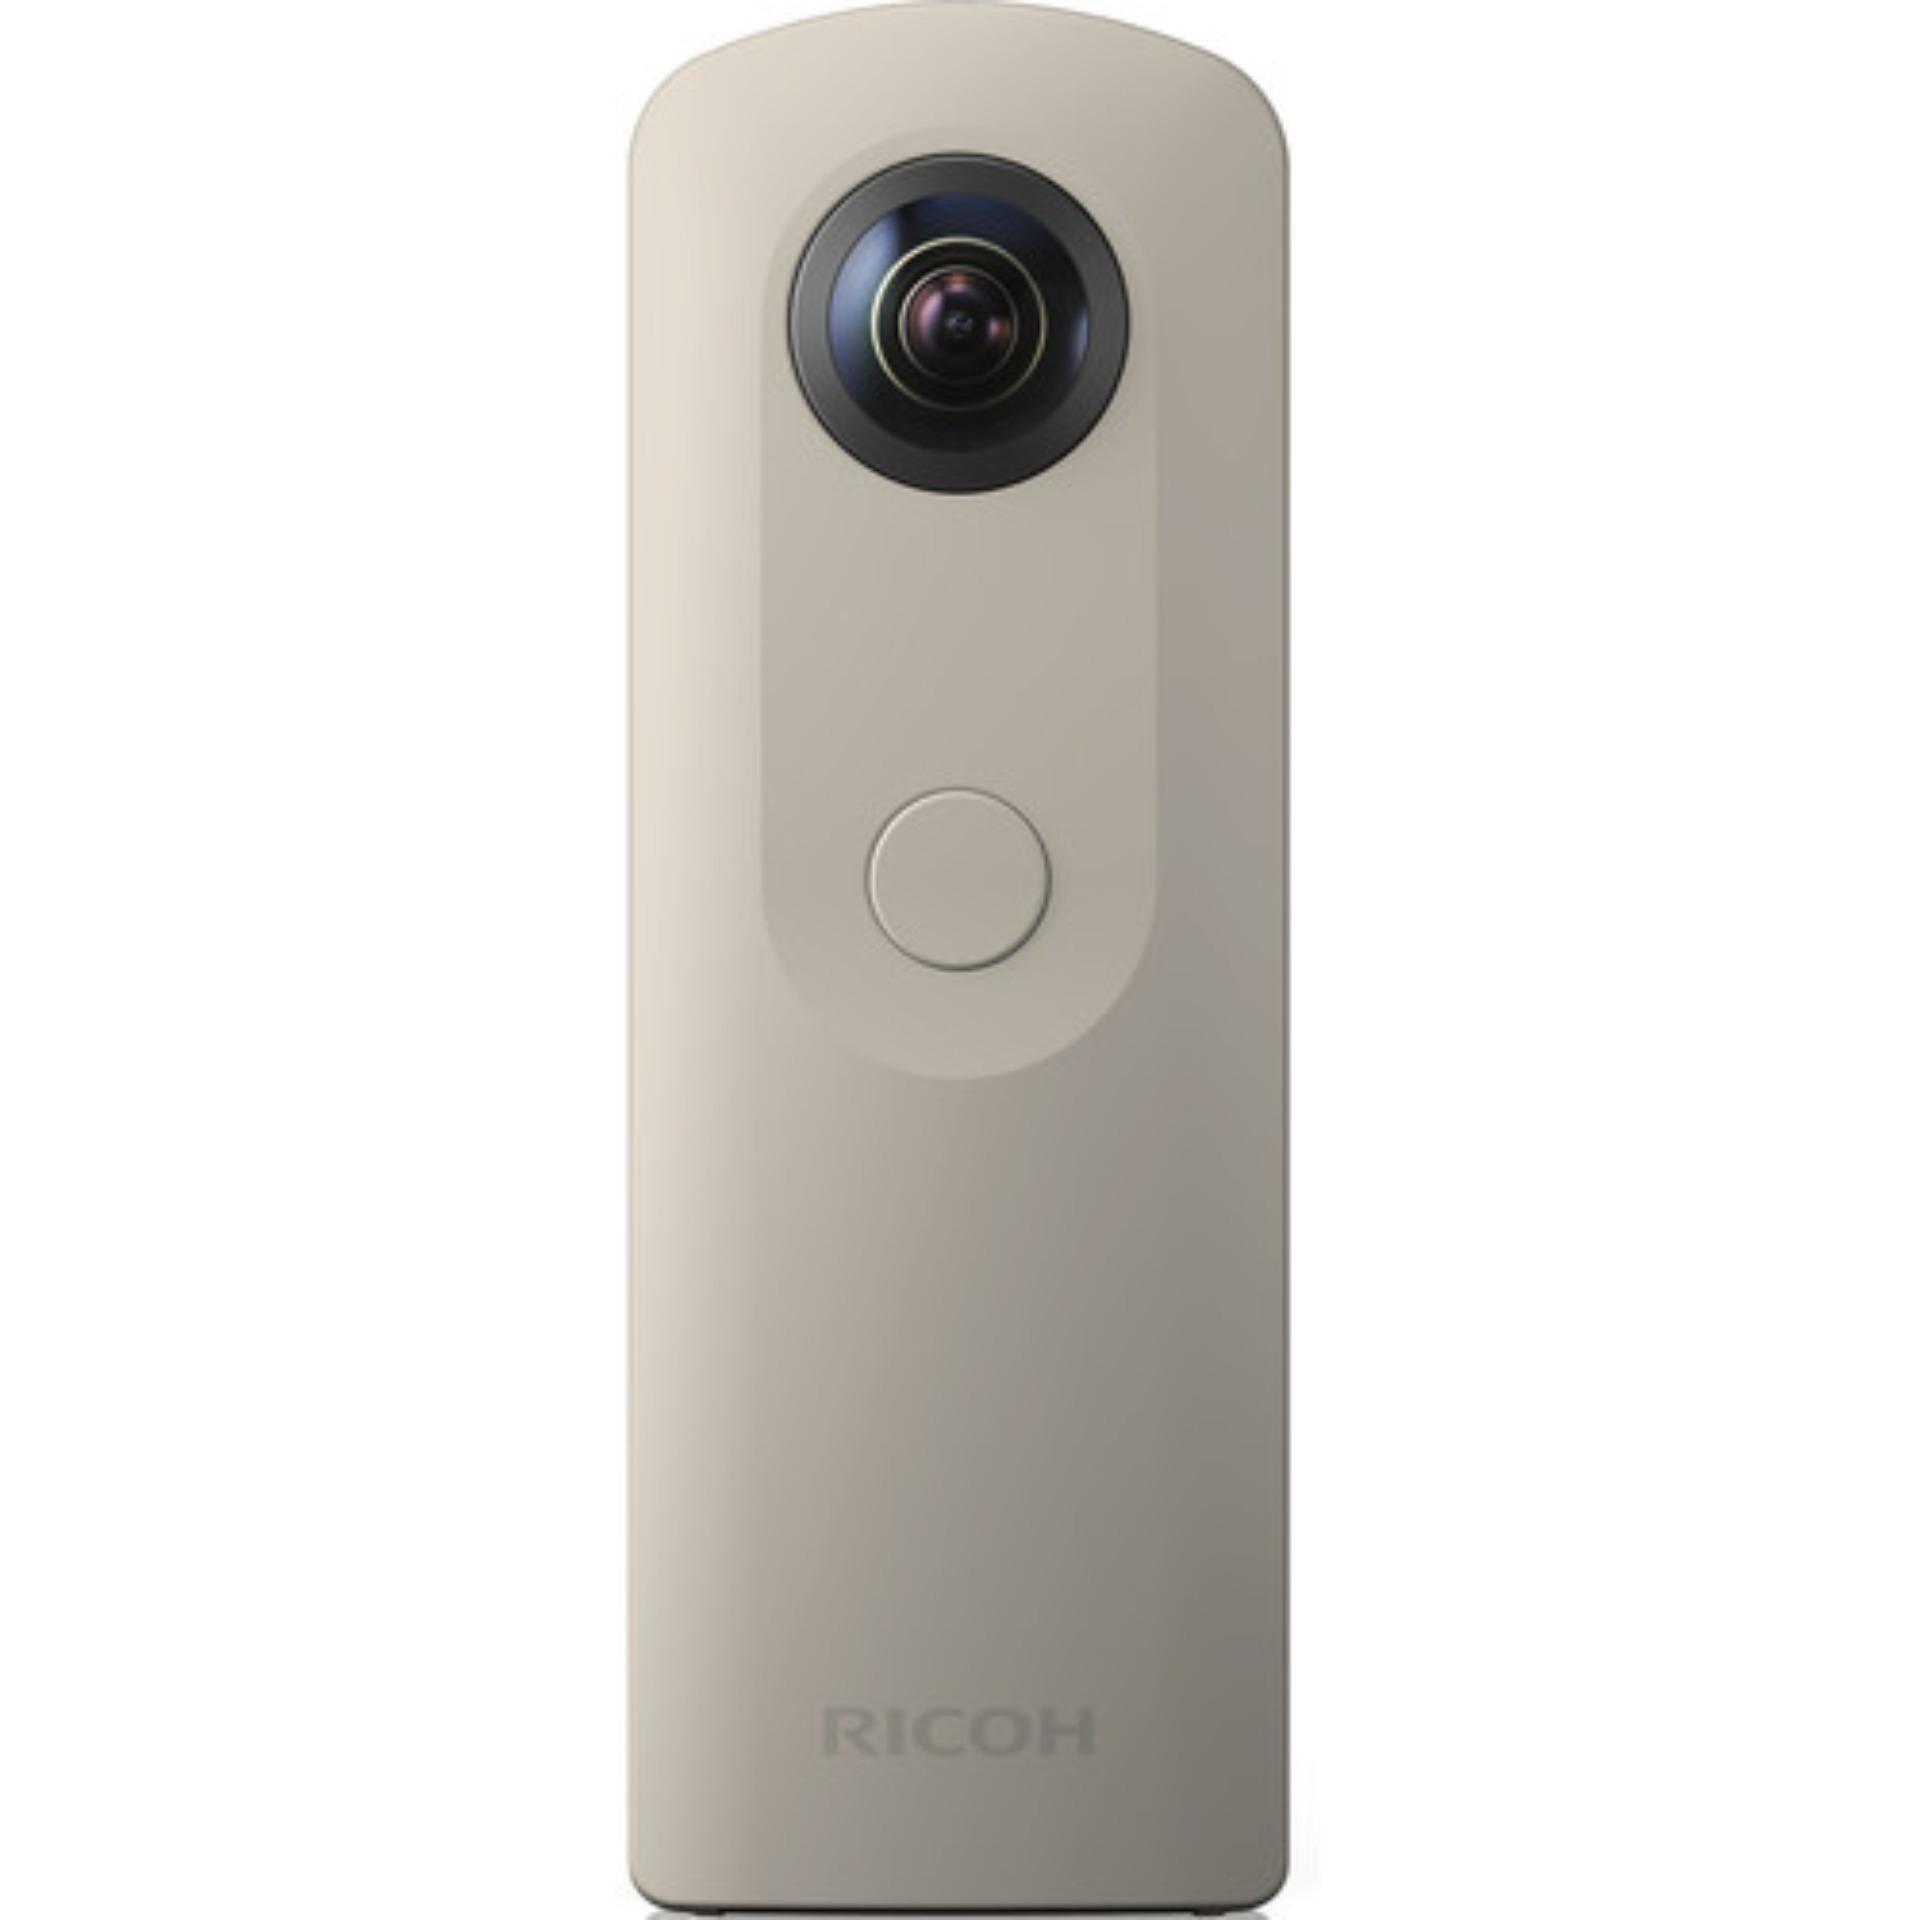 Ricoh Theta SC Spherical Digital Camera – [Beige]